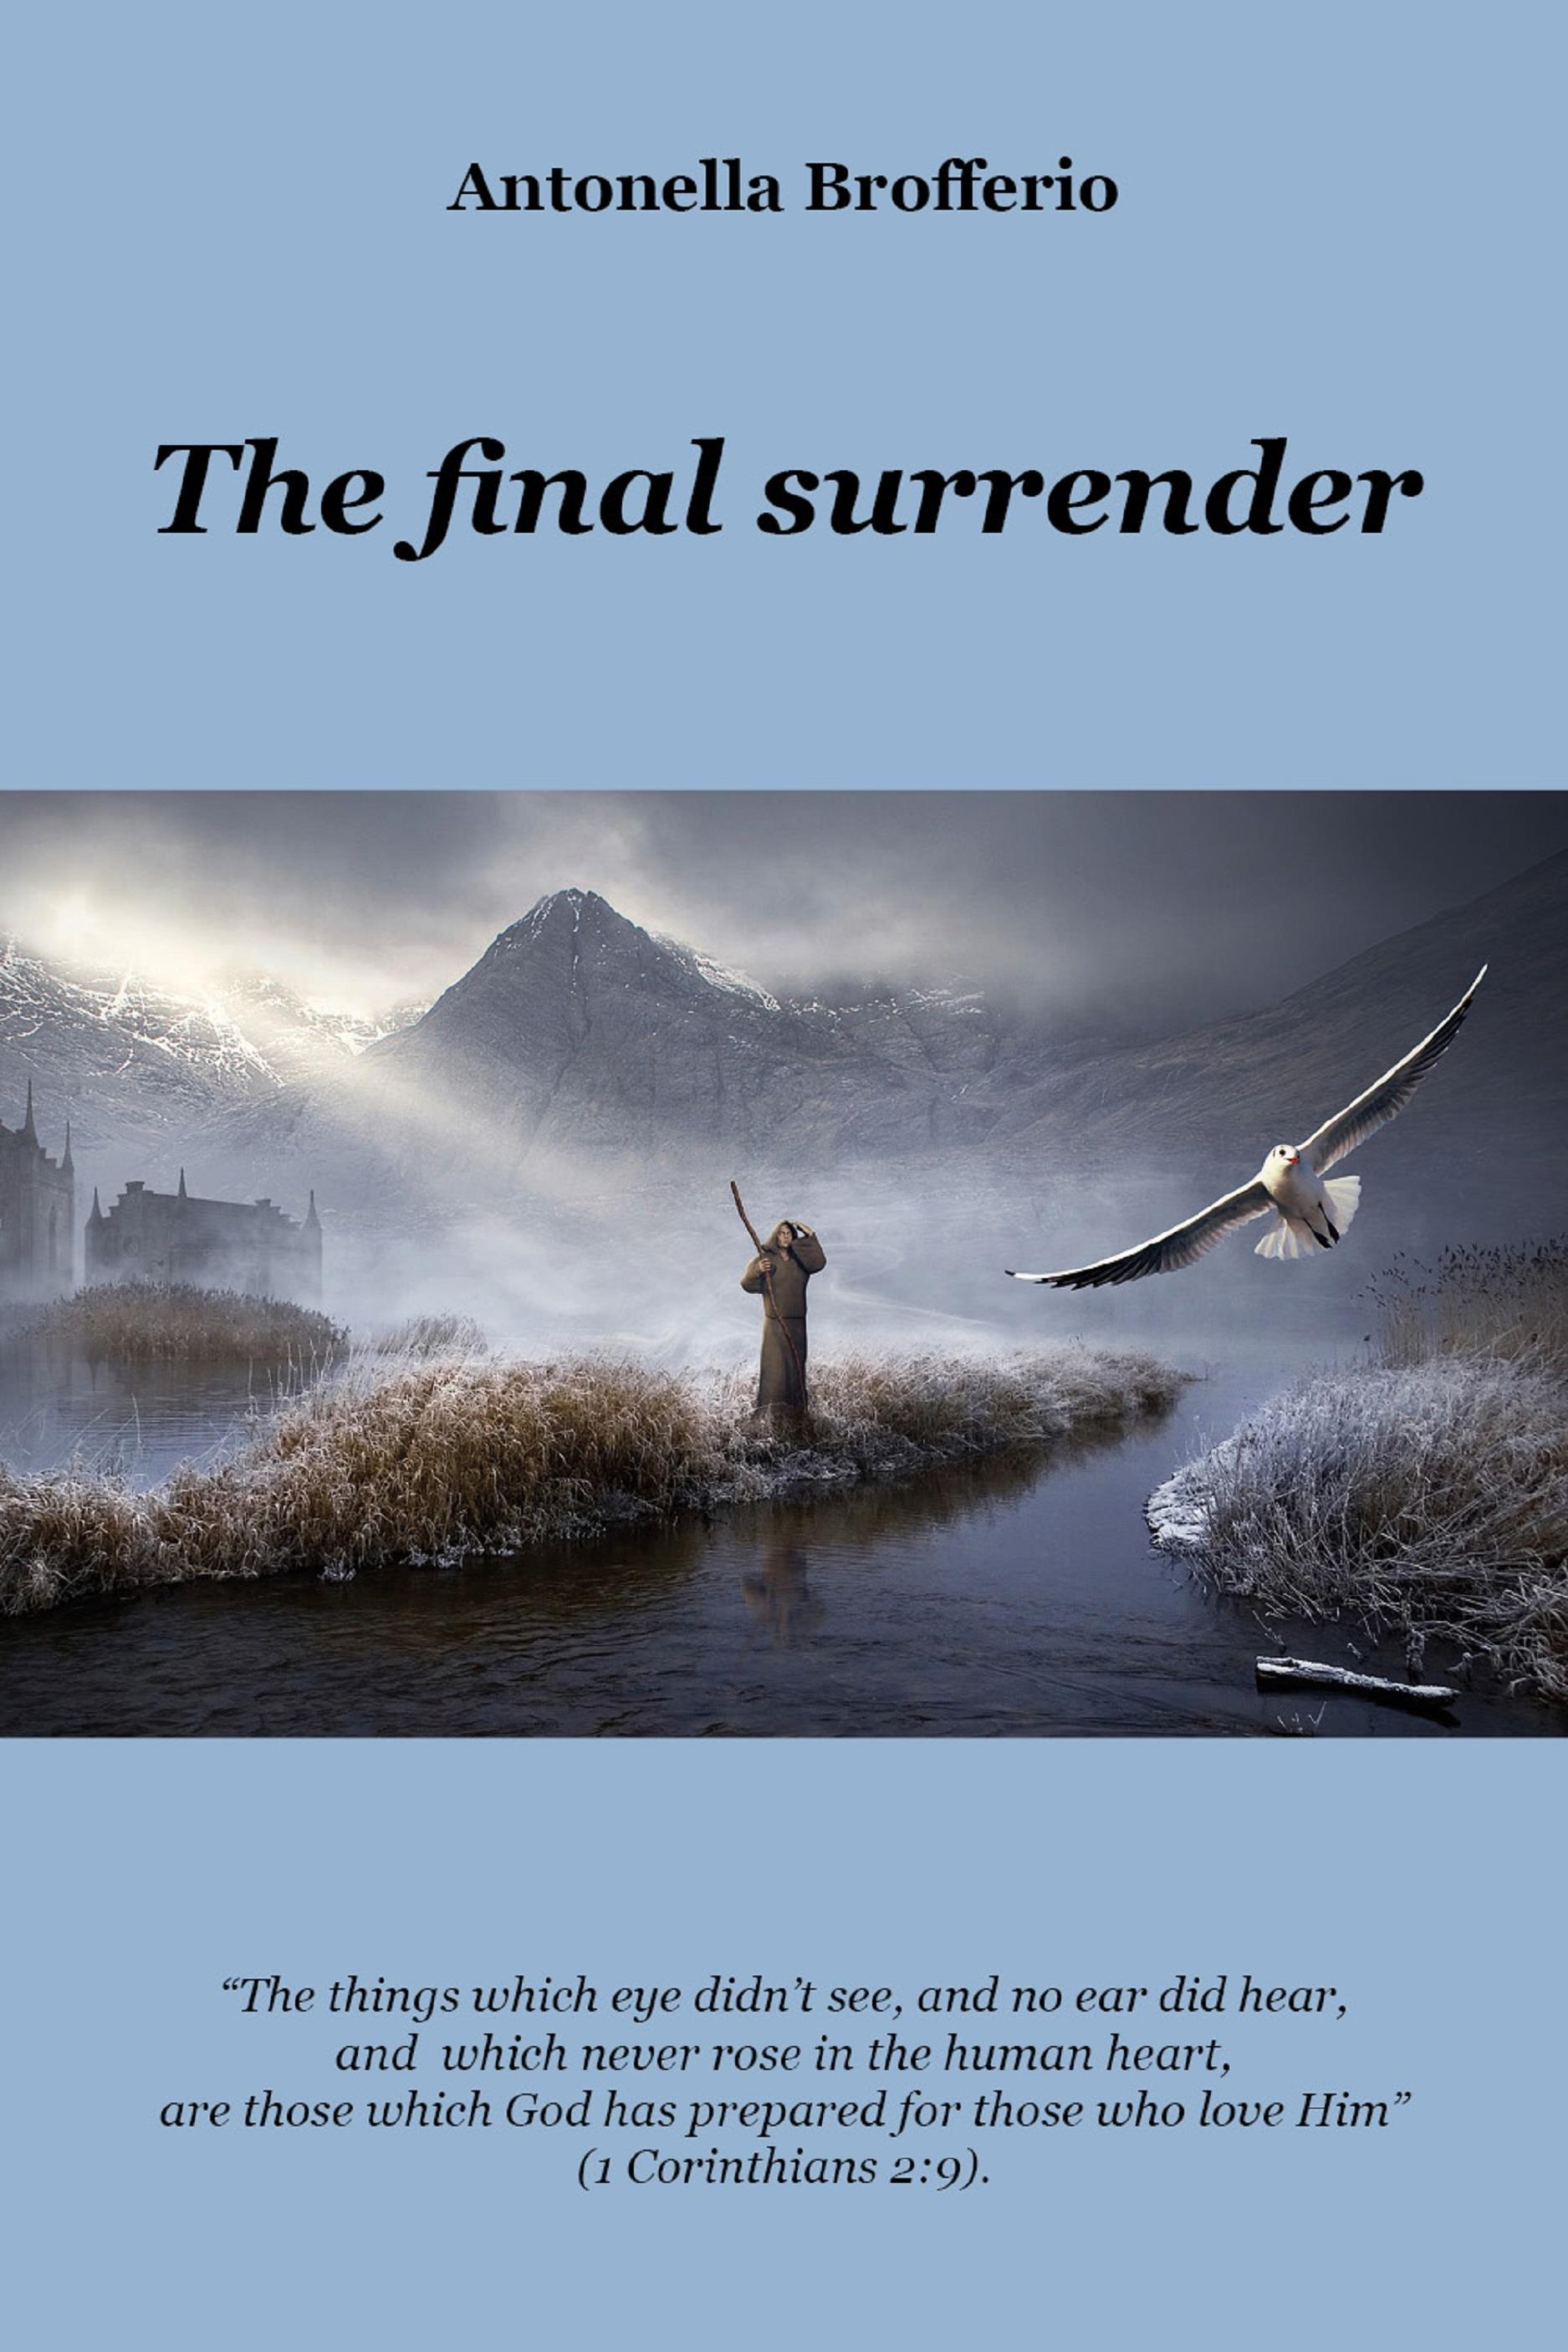 The final surrender